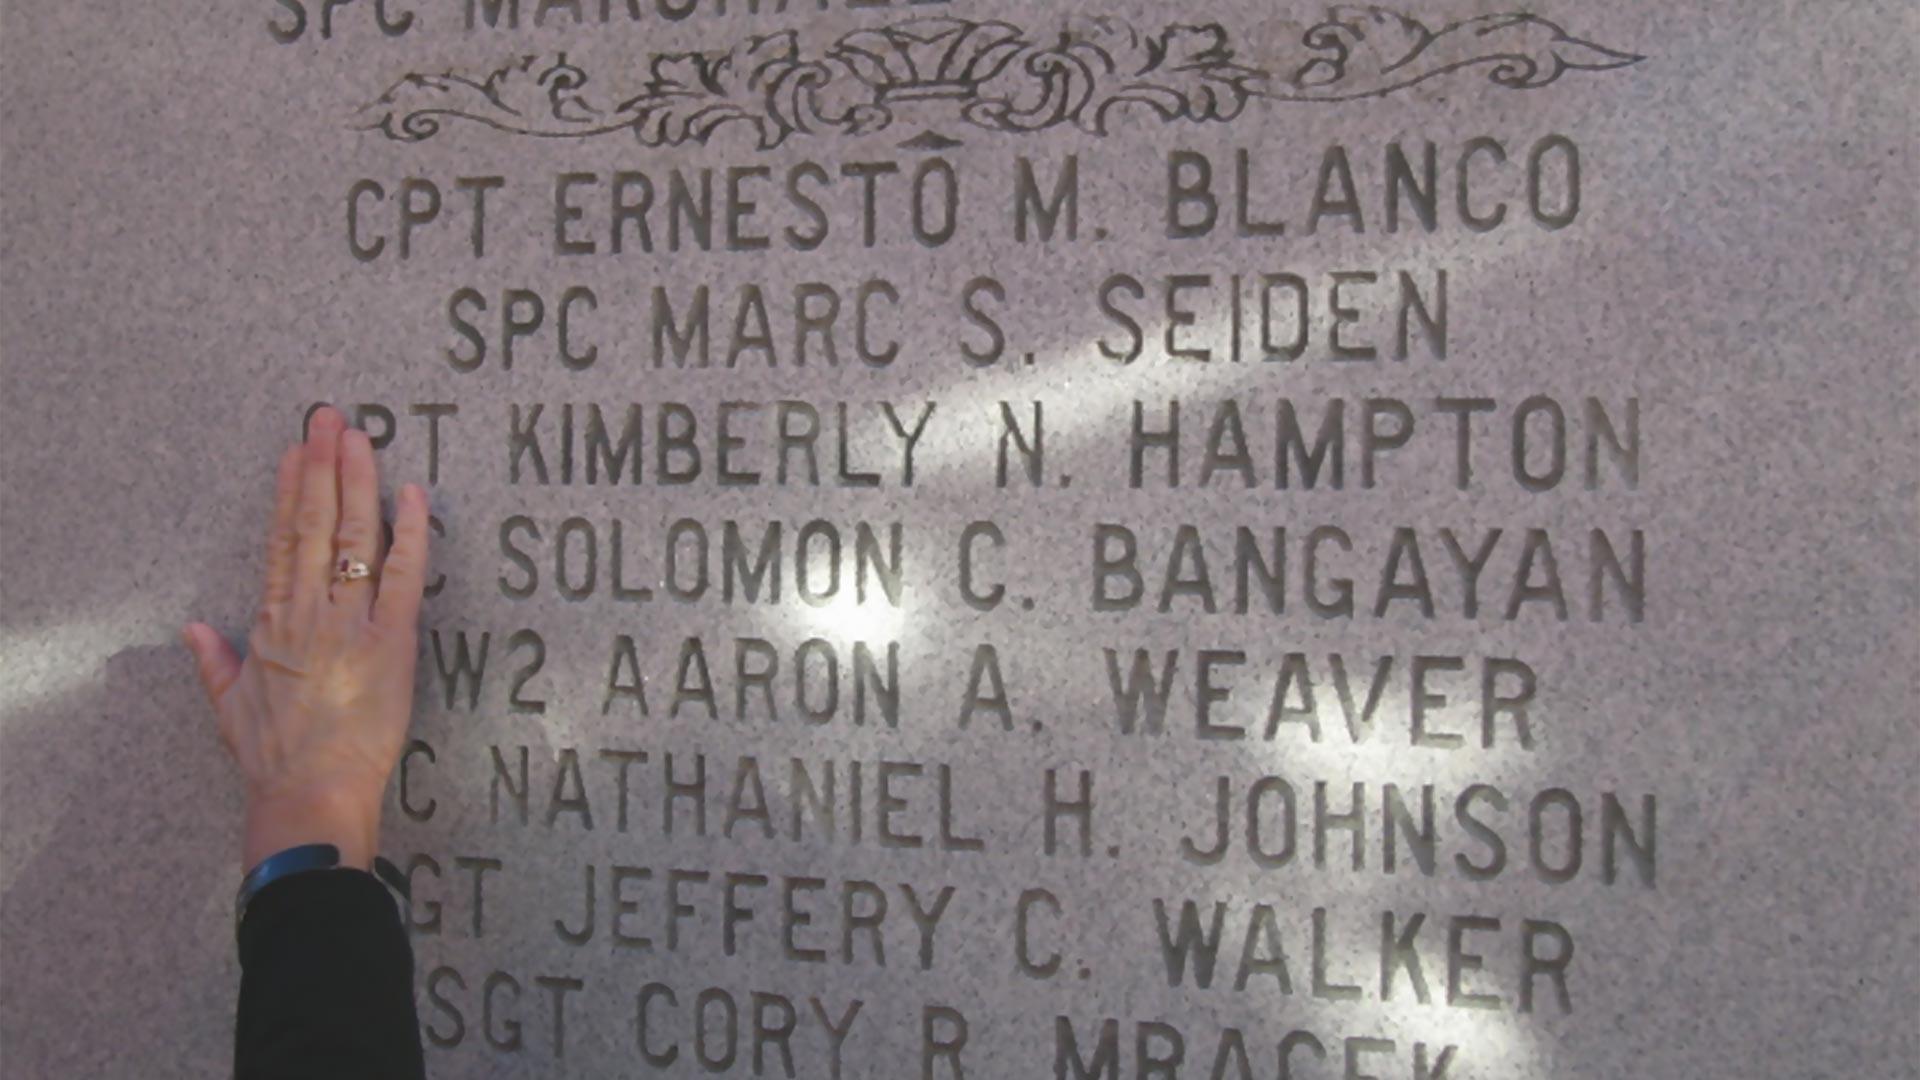 Captain Kimberly N. Hampton Name on Wall